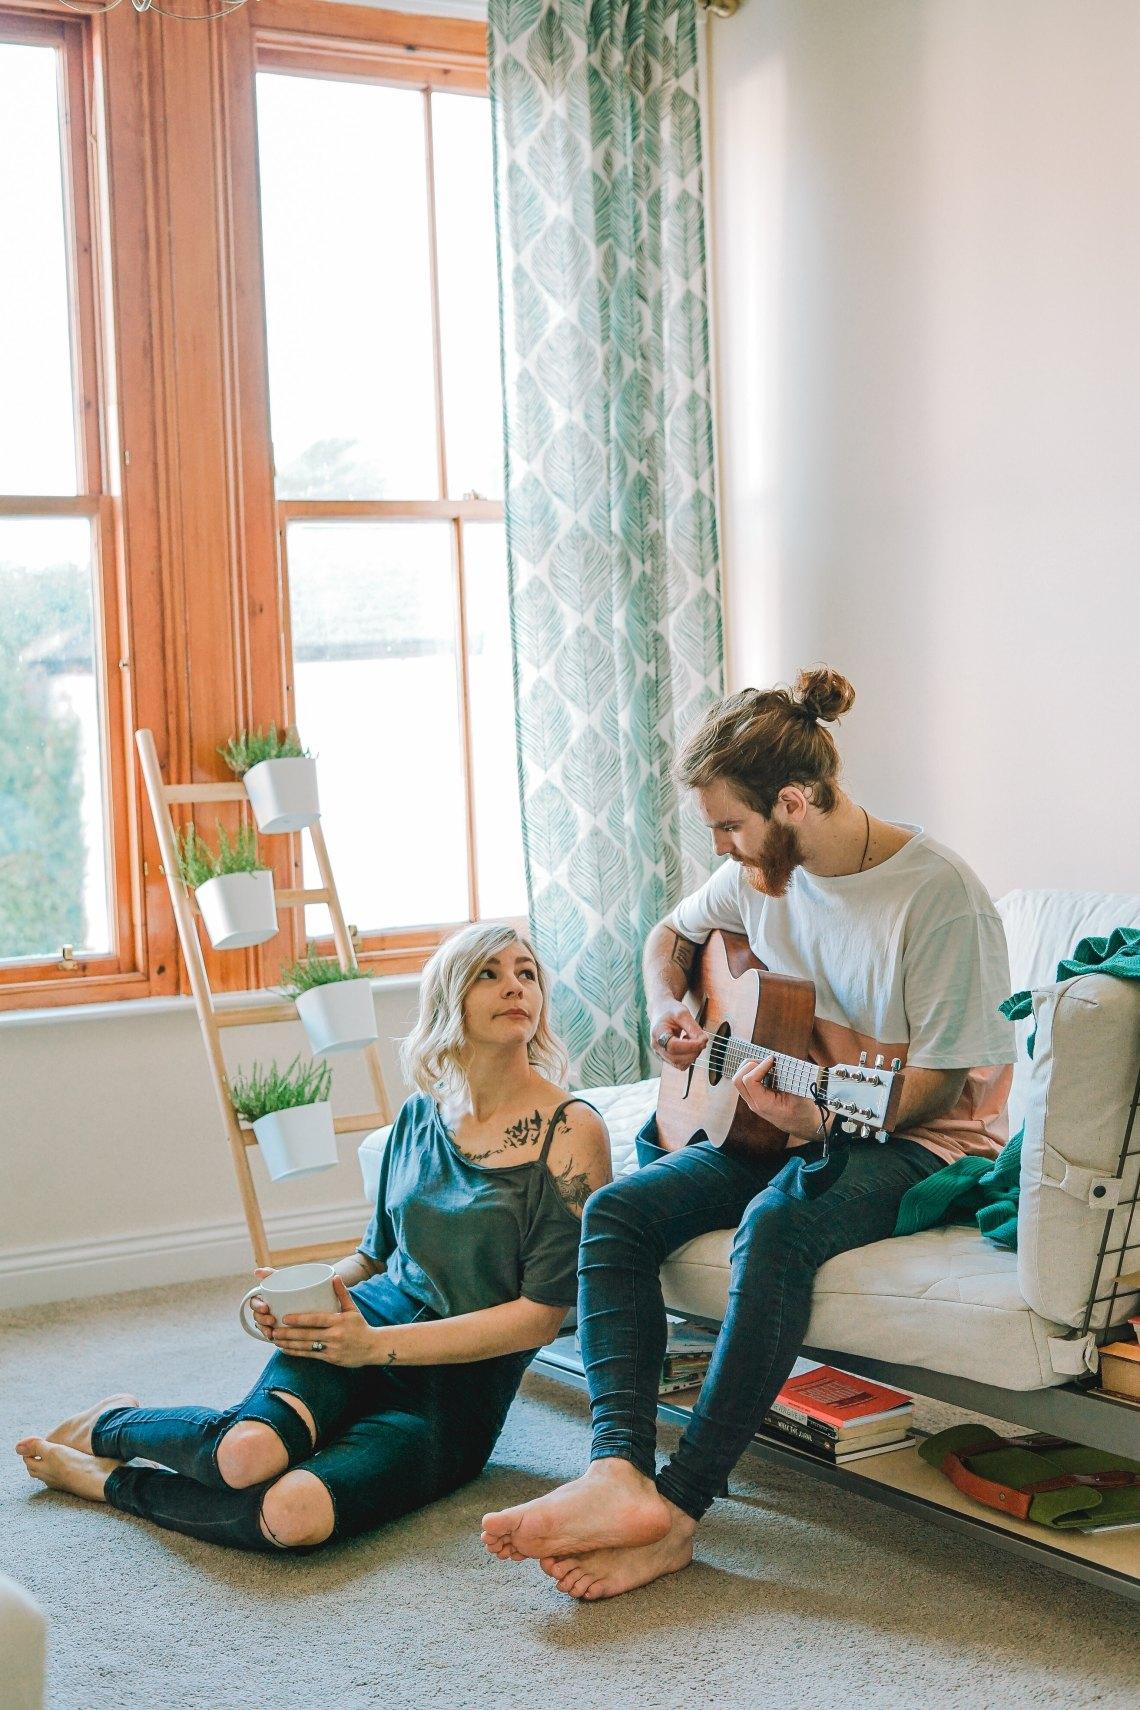 woman watching man play guitar